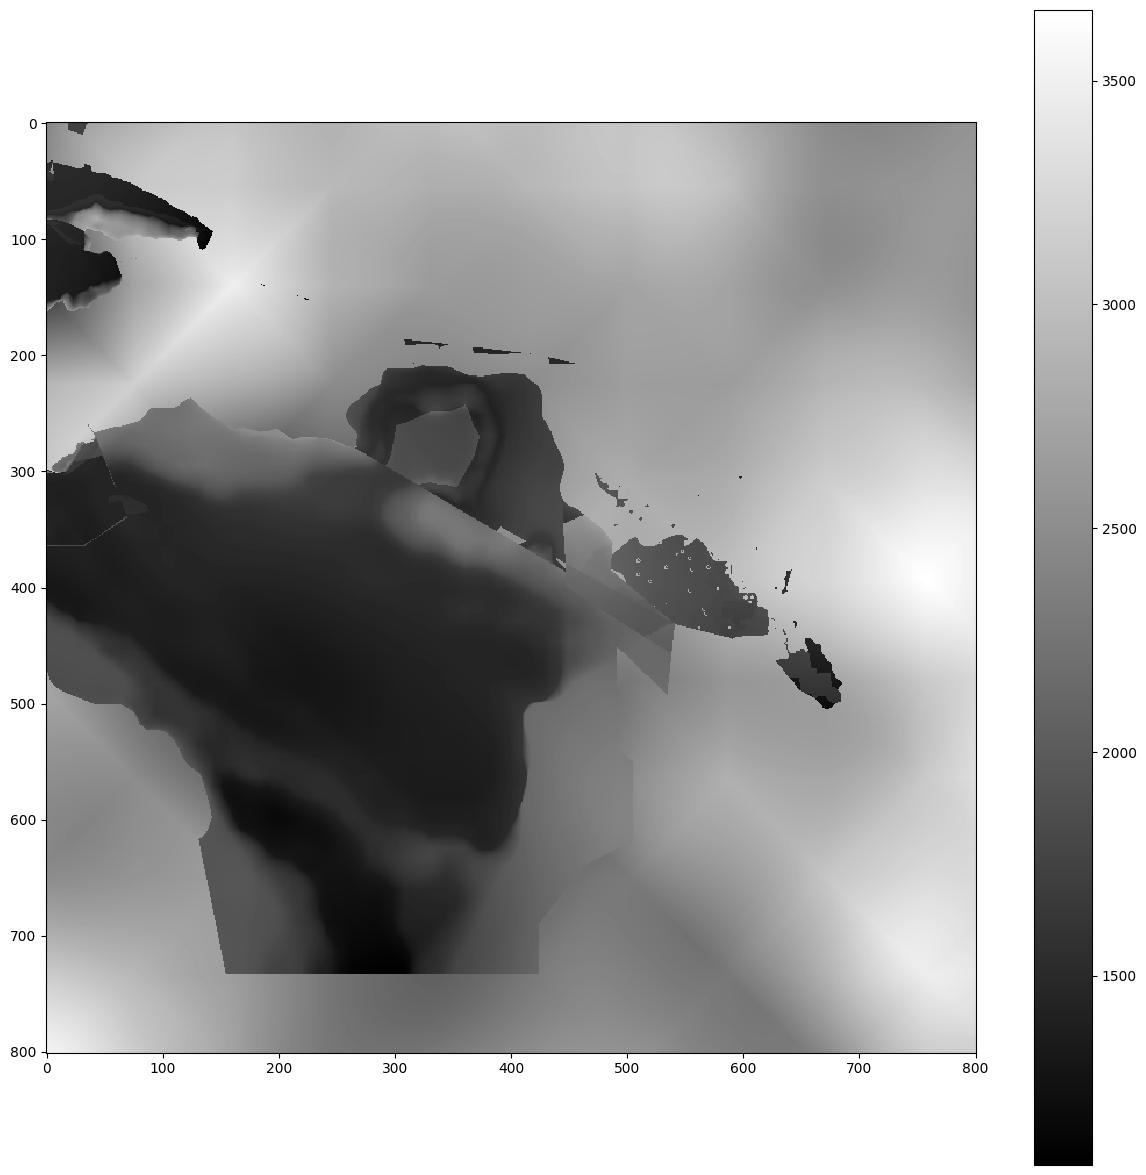 bench/seismic/wp/la_habra/meshes/velocity_model/plots/vs_1500.png